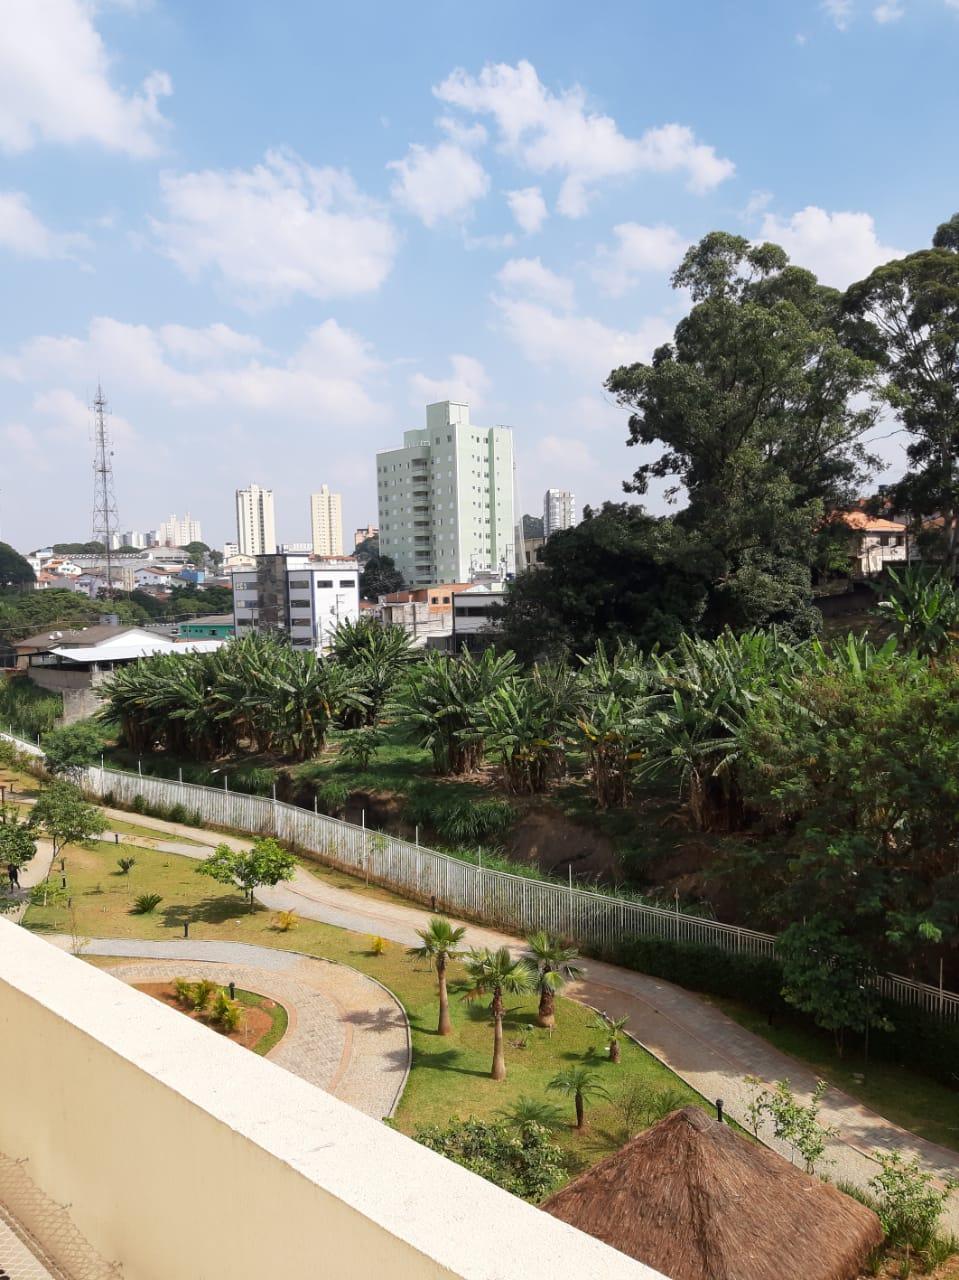 Sehira, Guarulhos, 2020.